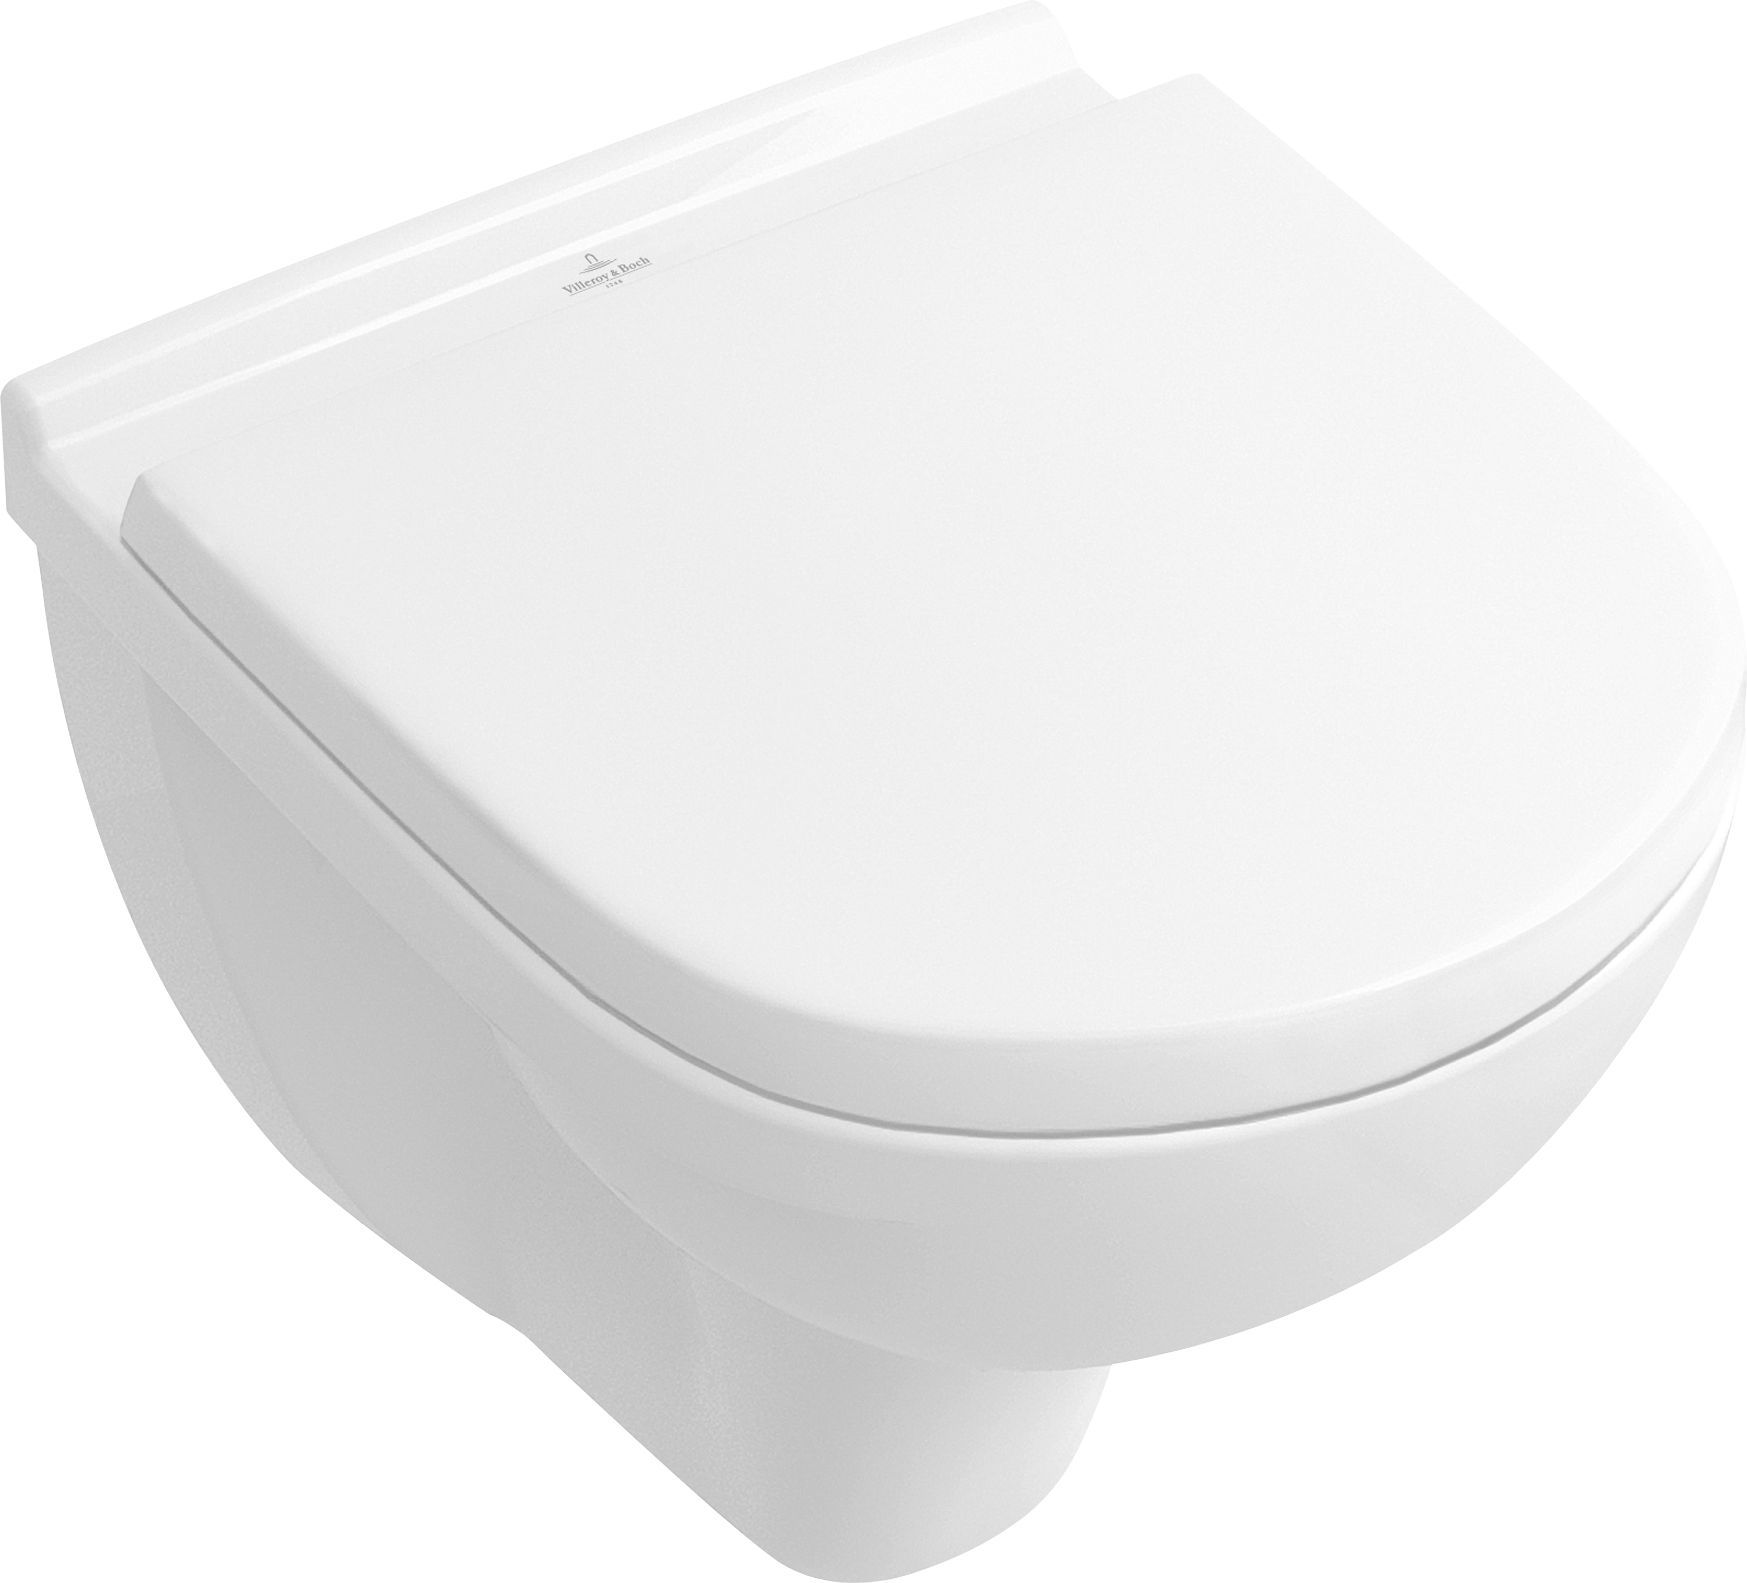 Villeroy & Boch O.Novo Compact Tiefspül-Wand-WC L:49xB:36cm weiß mit Ceramicplus 568810R1